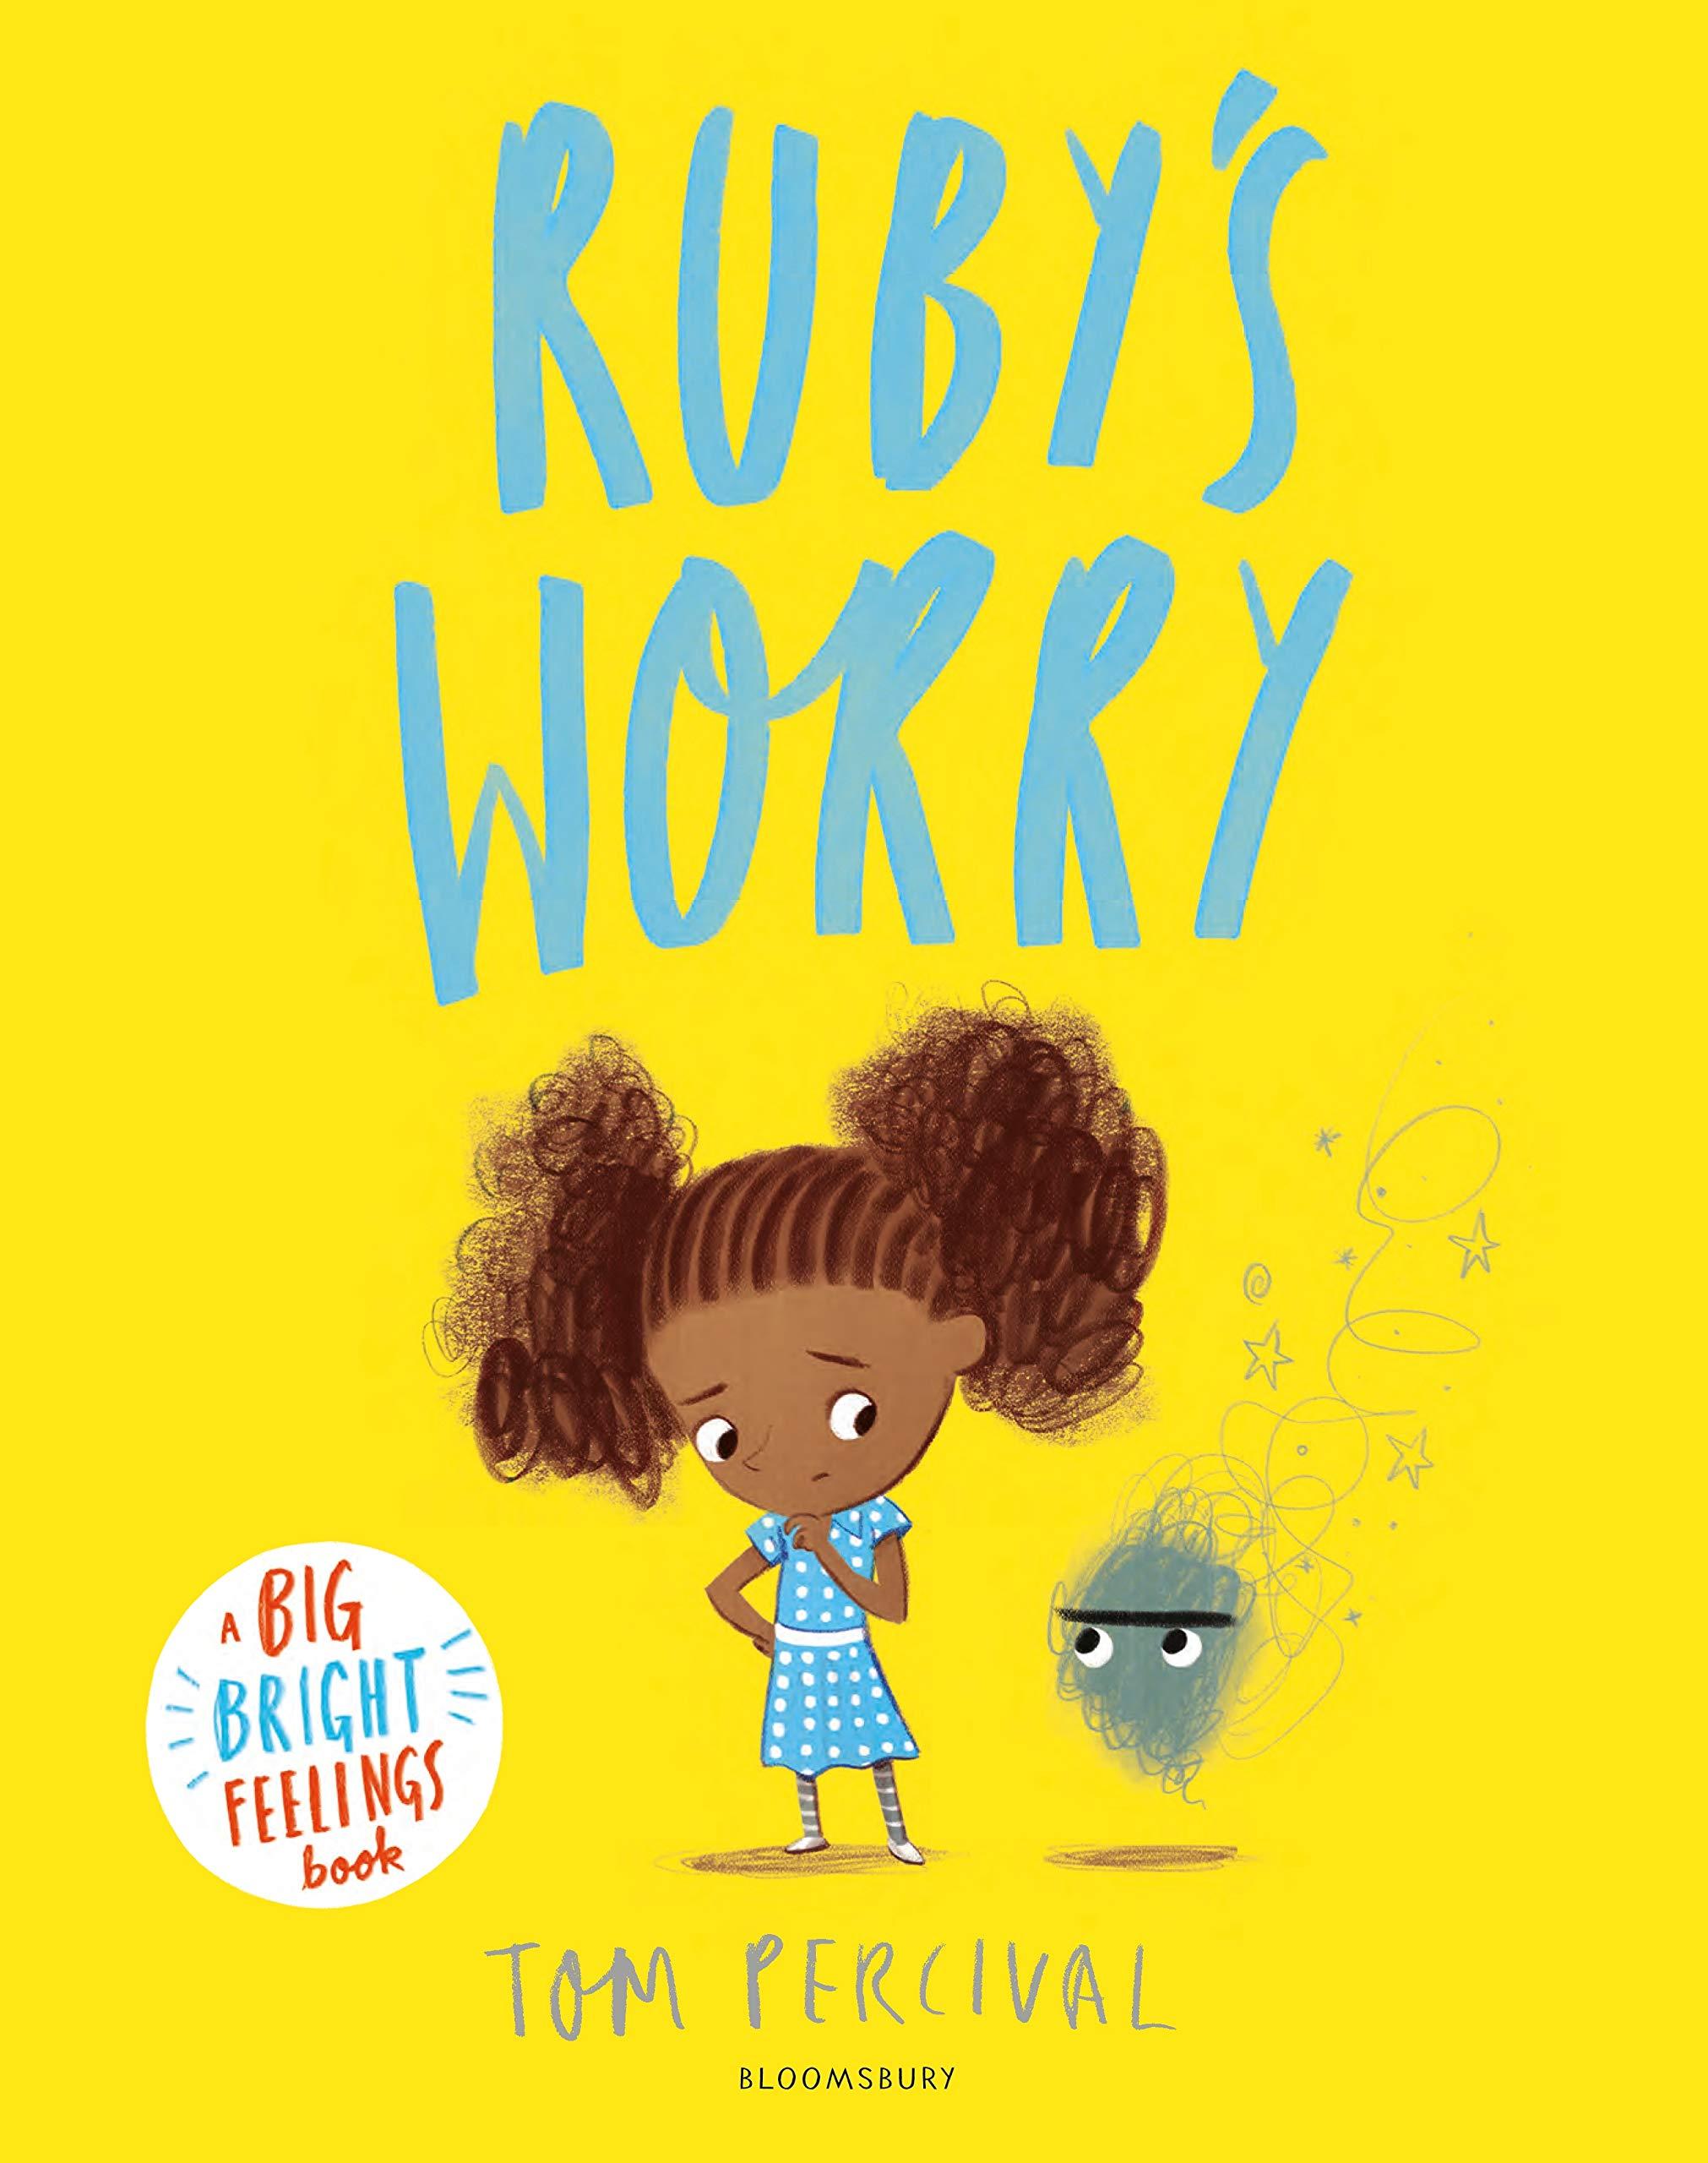 Ruby's Worry: A Big Bright Feelings Book: Amazon.co.uk: Percival, Tom,  Percival, Tom: Books